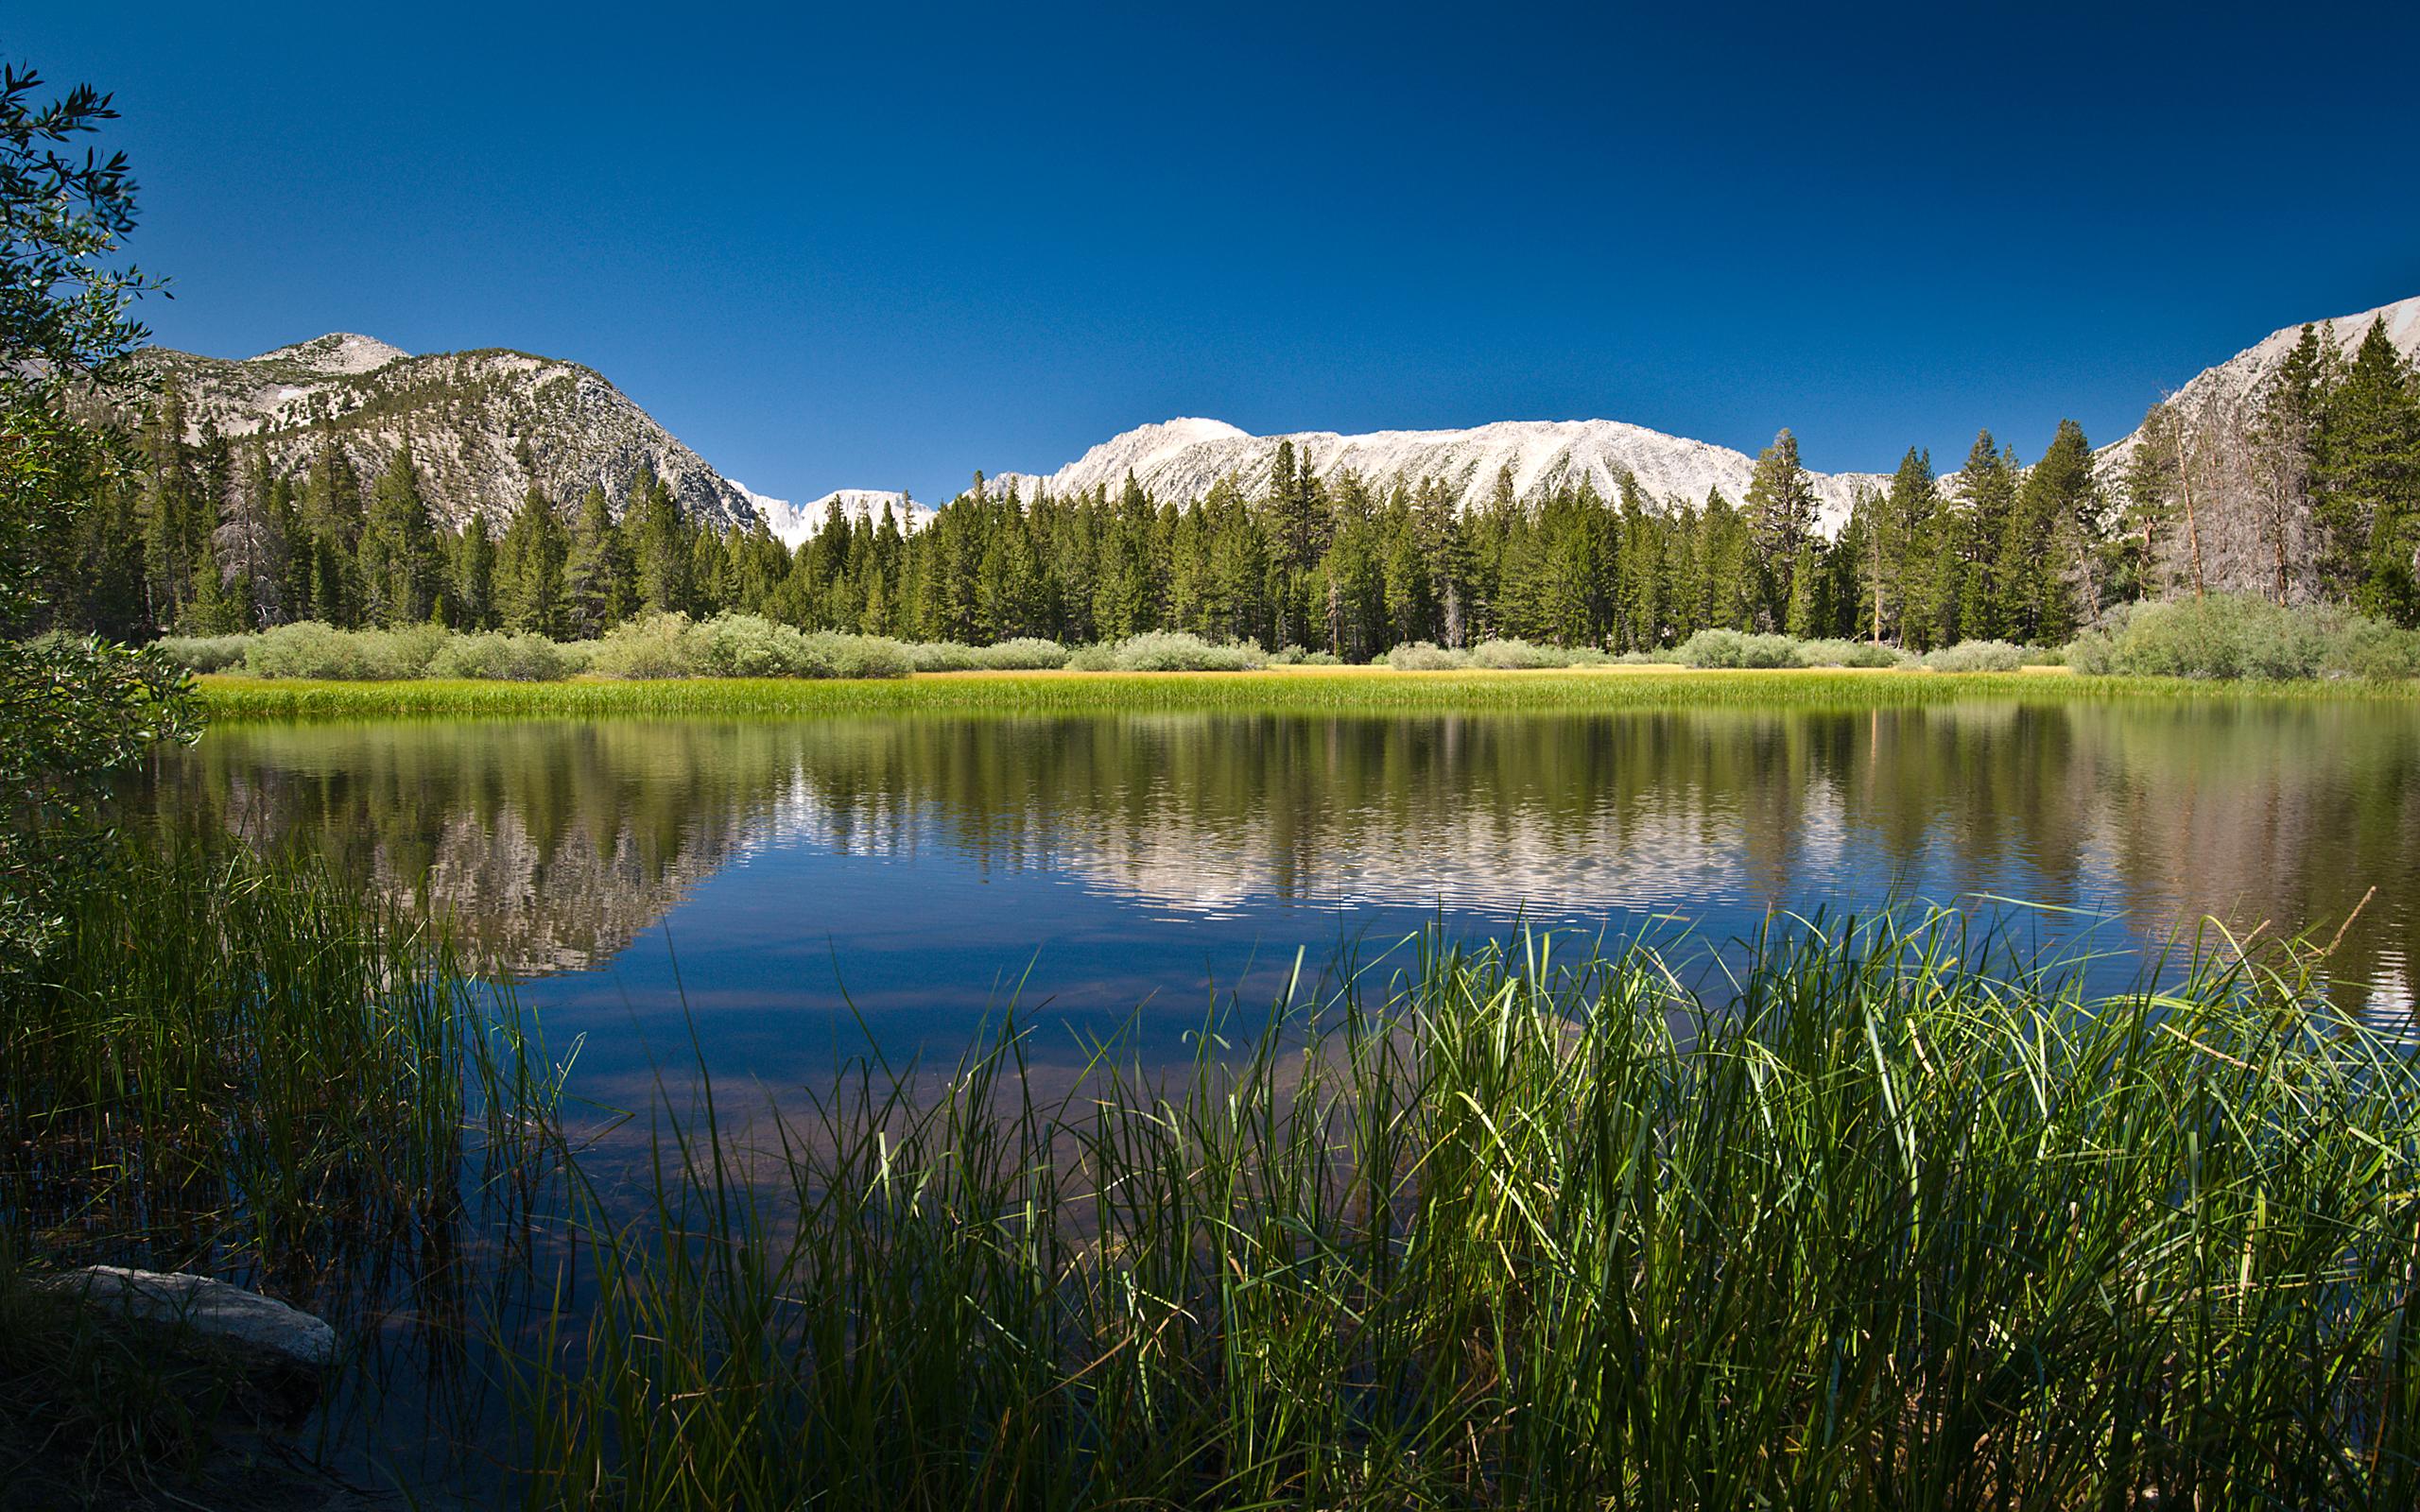 widescreen HD Lake Wallpaper